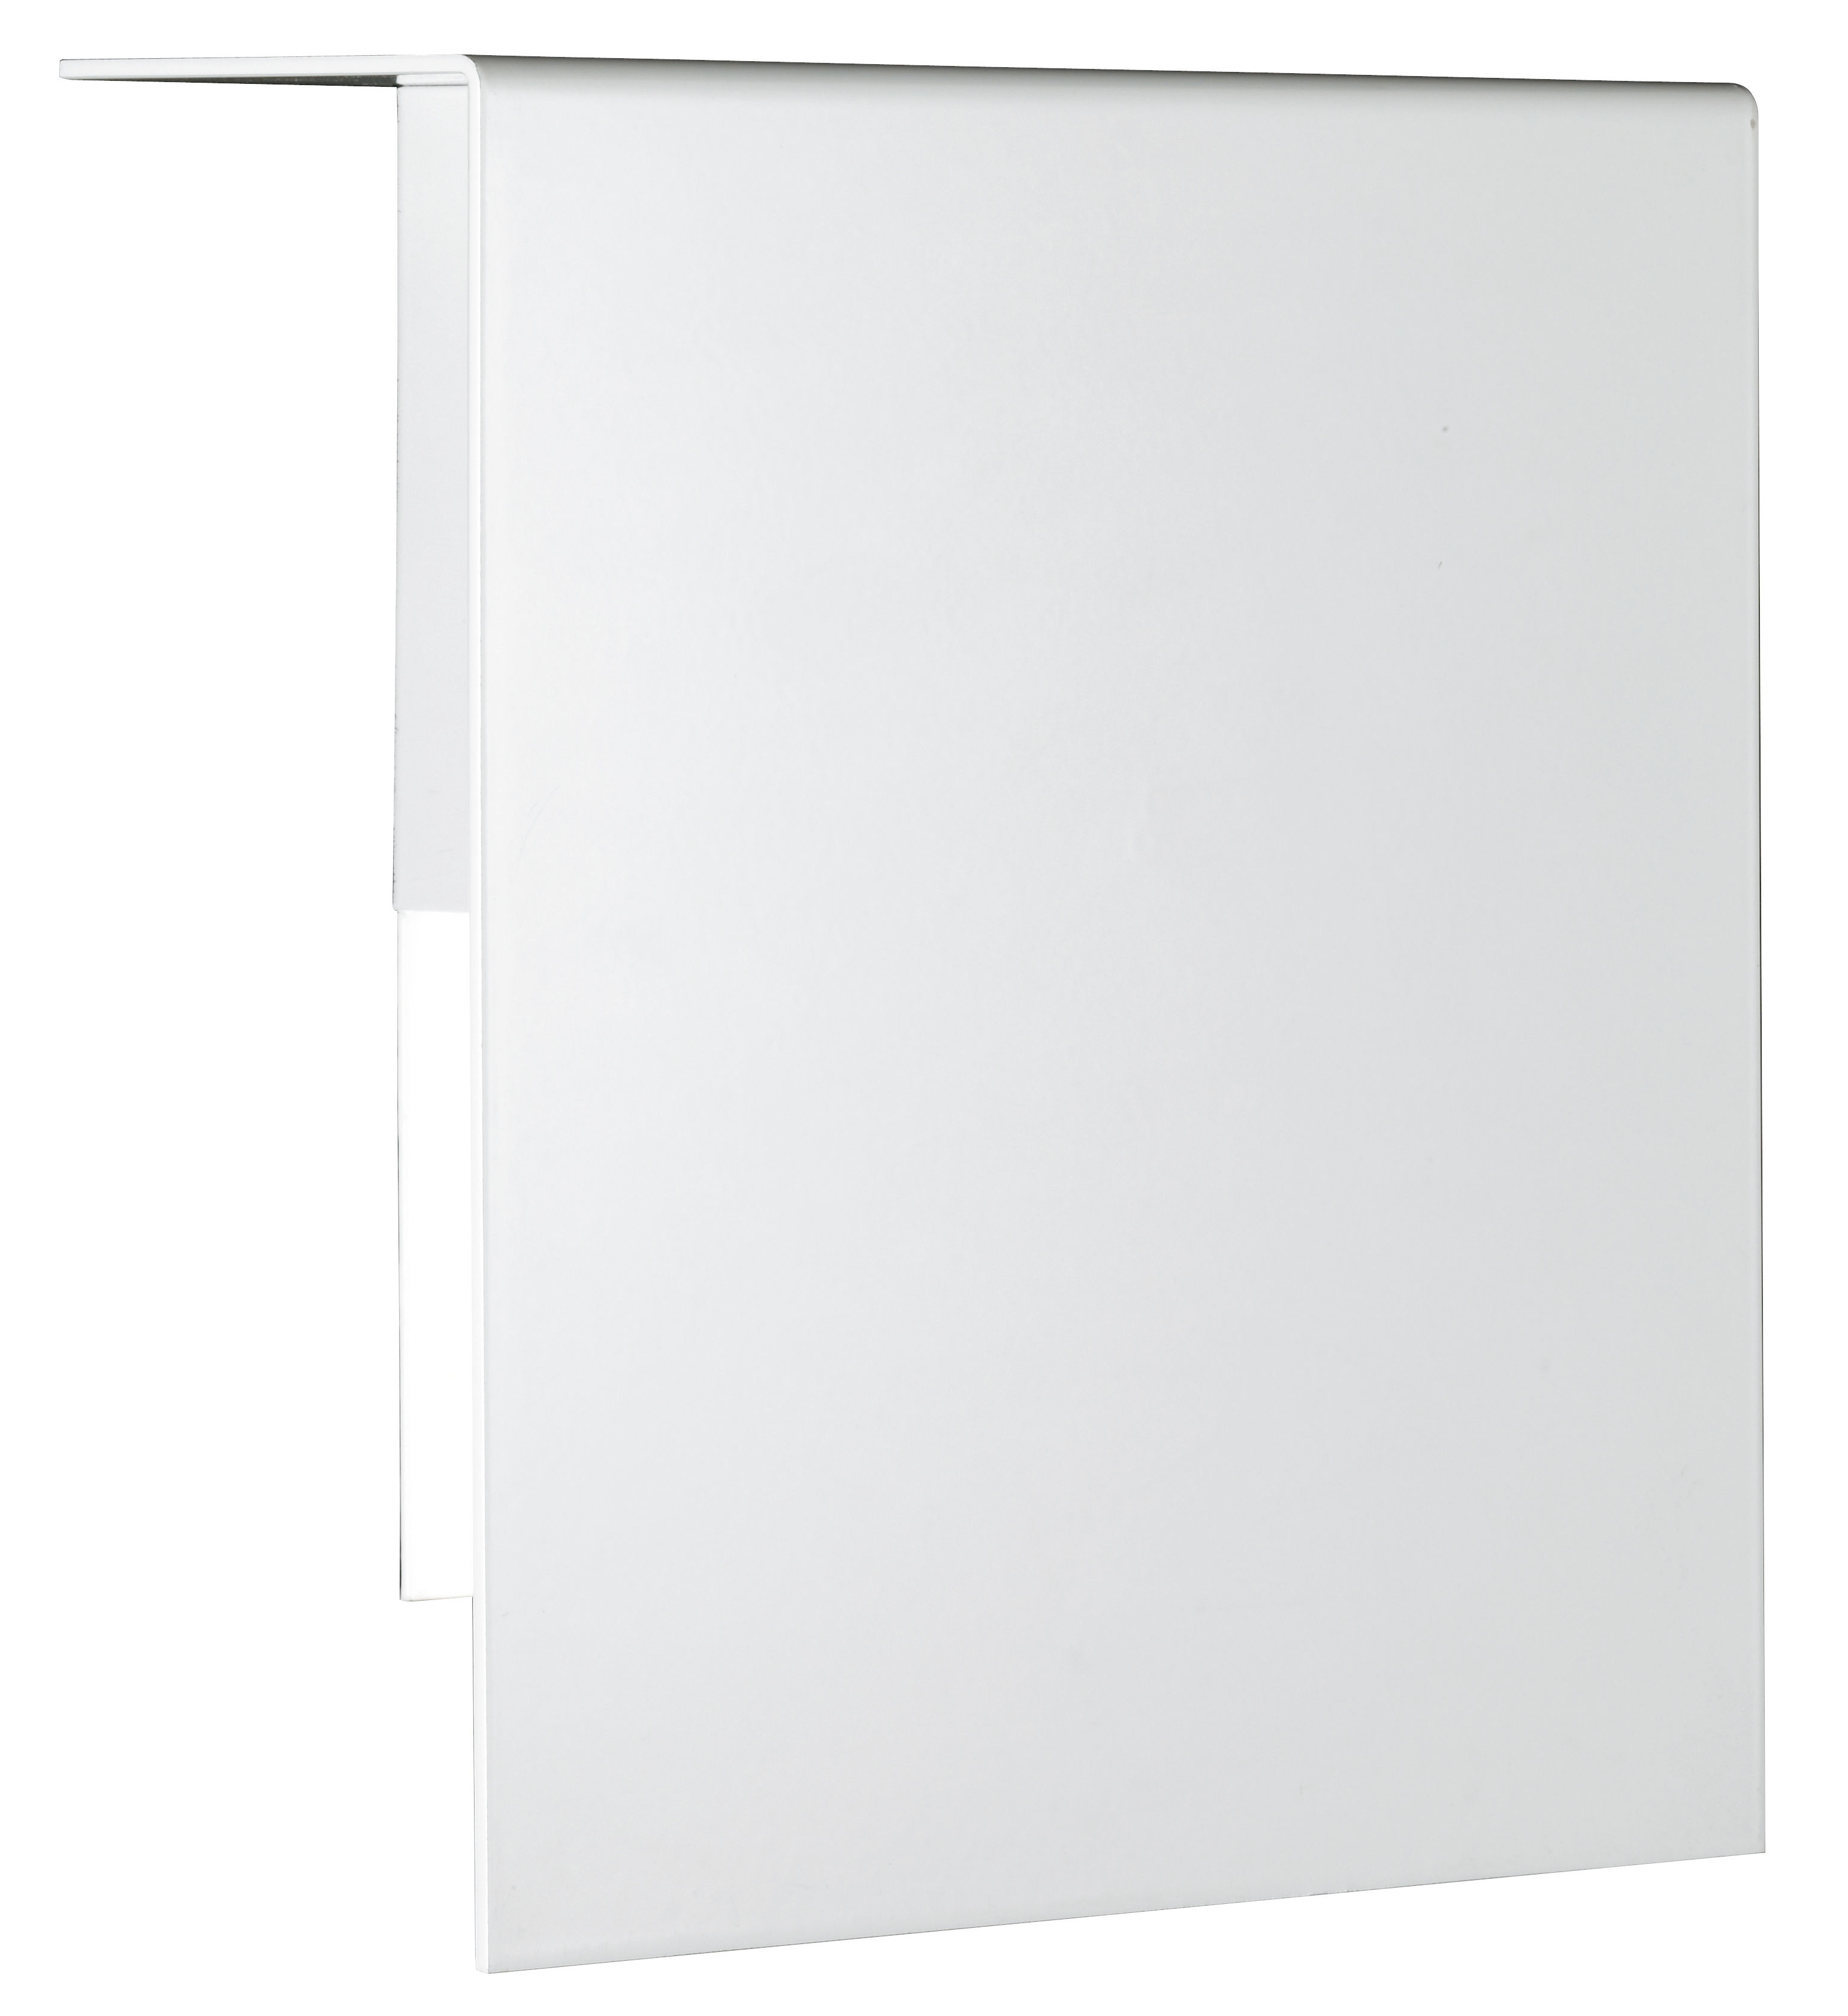 Luminaire - Appliques - Applique Corrubedo - Fontana Arte - Blanc - Métal laqué